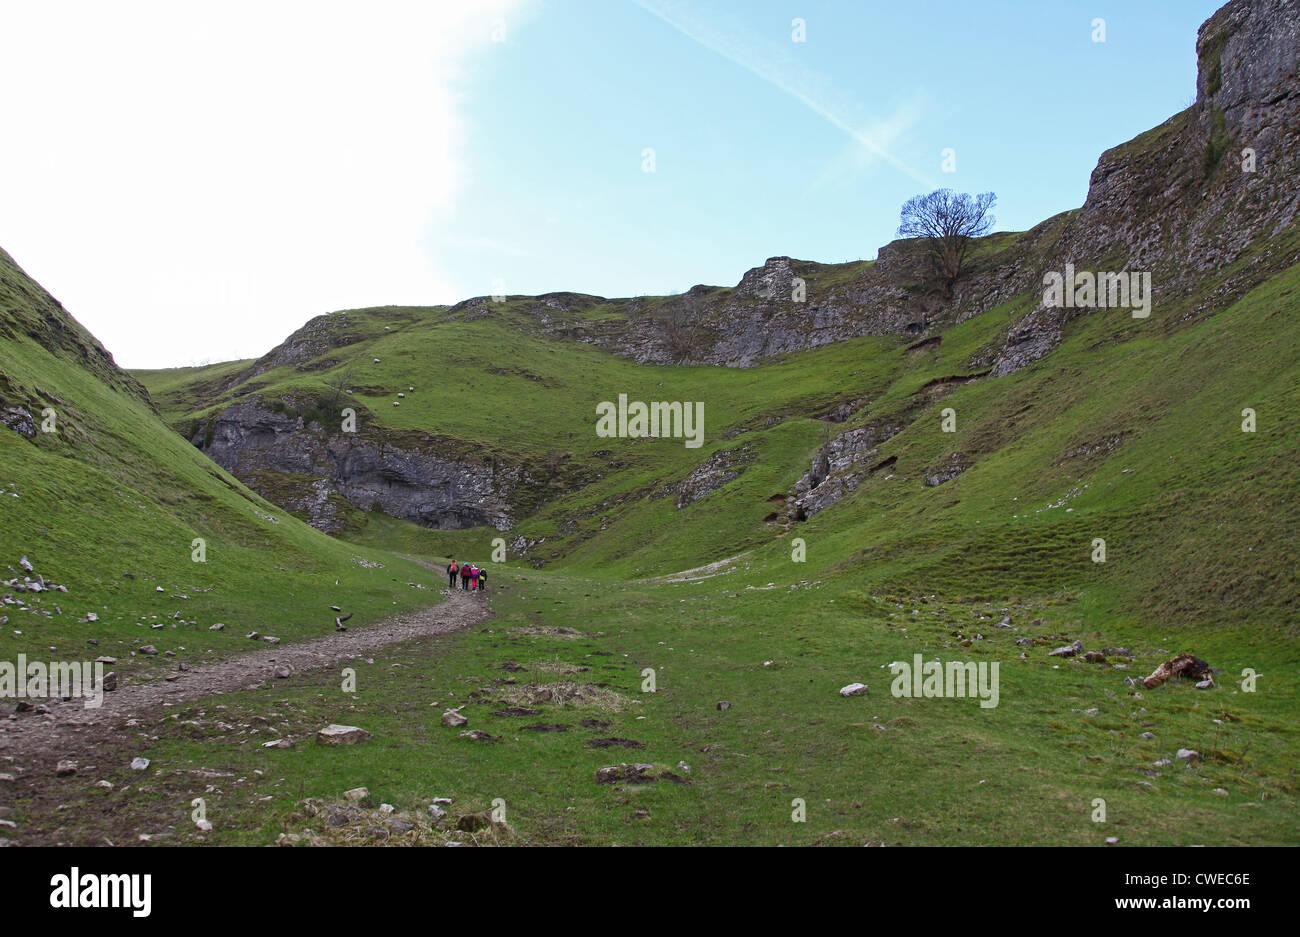 The Limestone Way at Cave Dale Castleton Derbyshire England UK - Stock Image